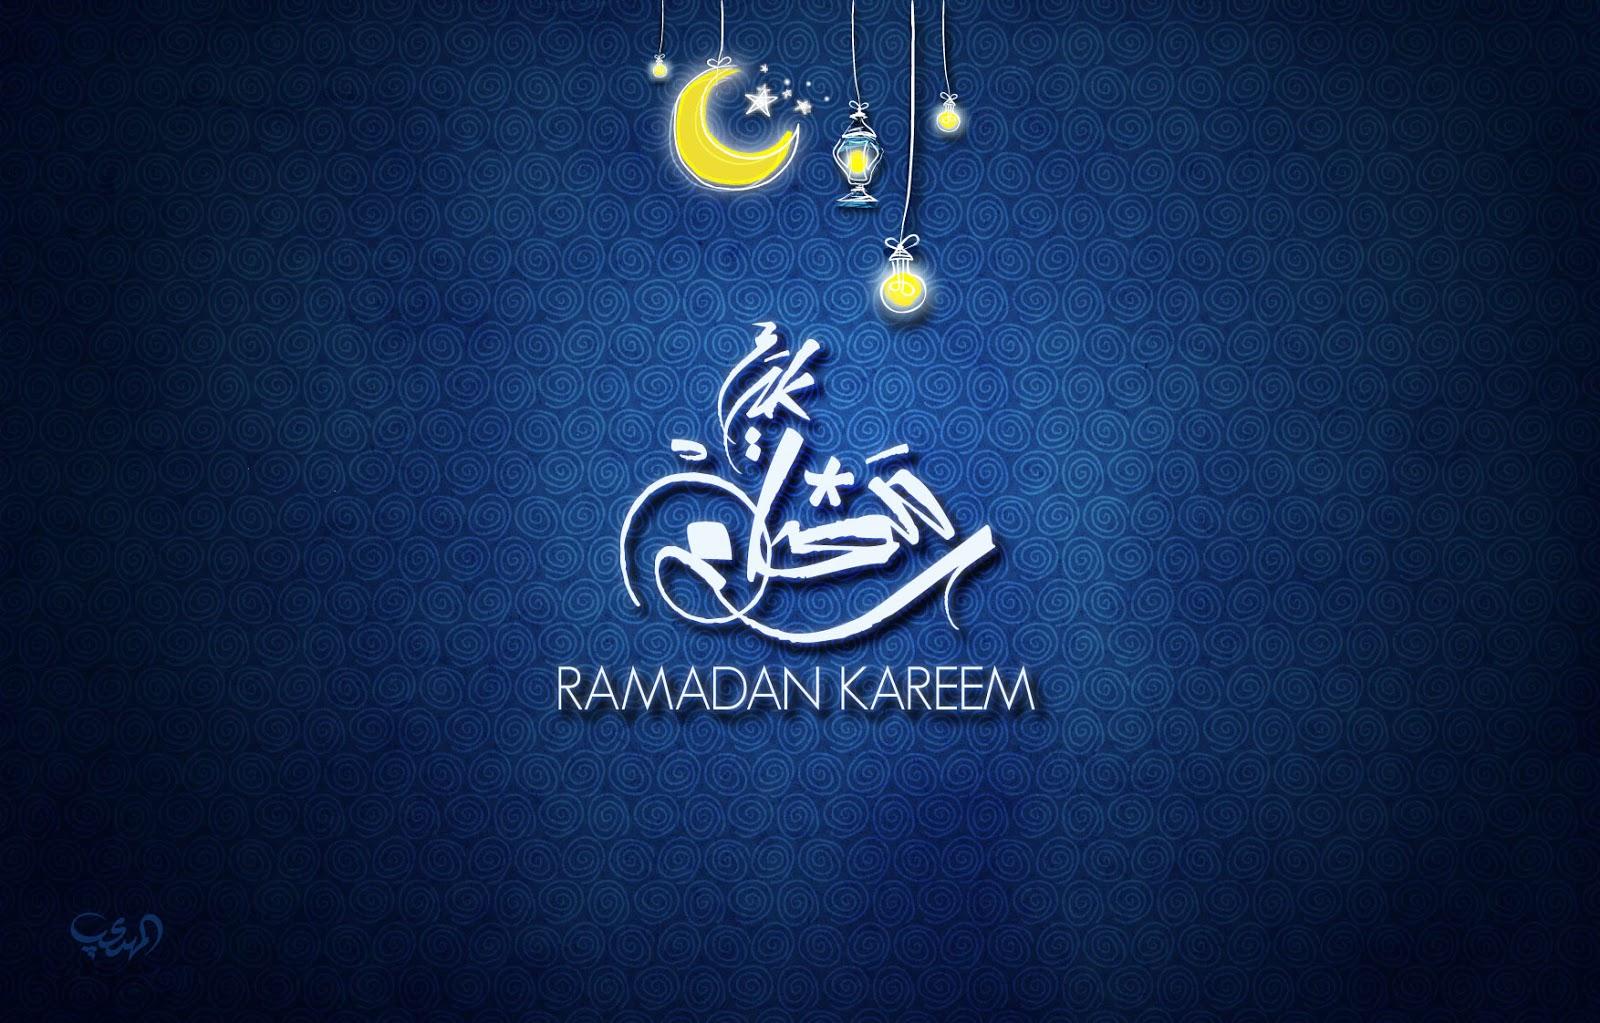 صور رمضان 2020 أجمل صور فوانيس رمضان 2021 بطاقات تهنئة لرمضان تهنئة رمضان بالأسماء 16